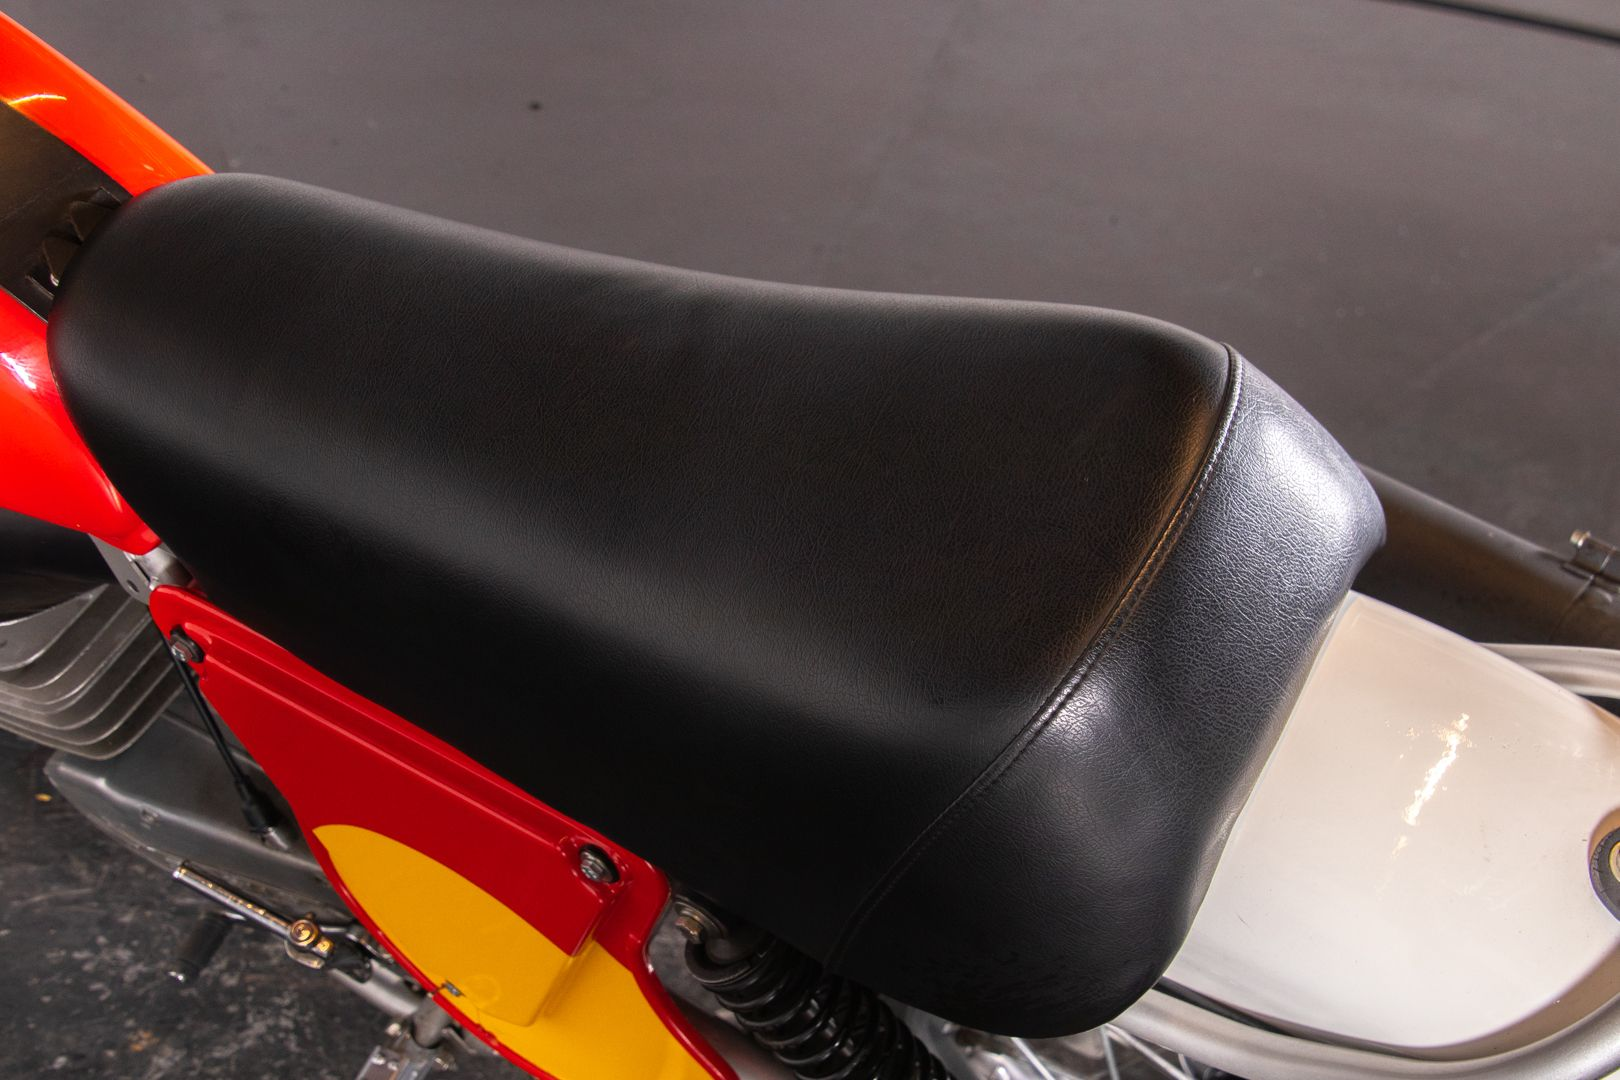 1974 KTM 125 GS 48766